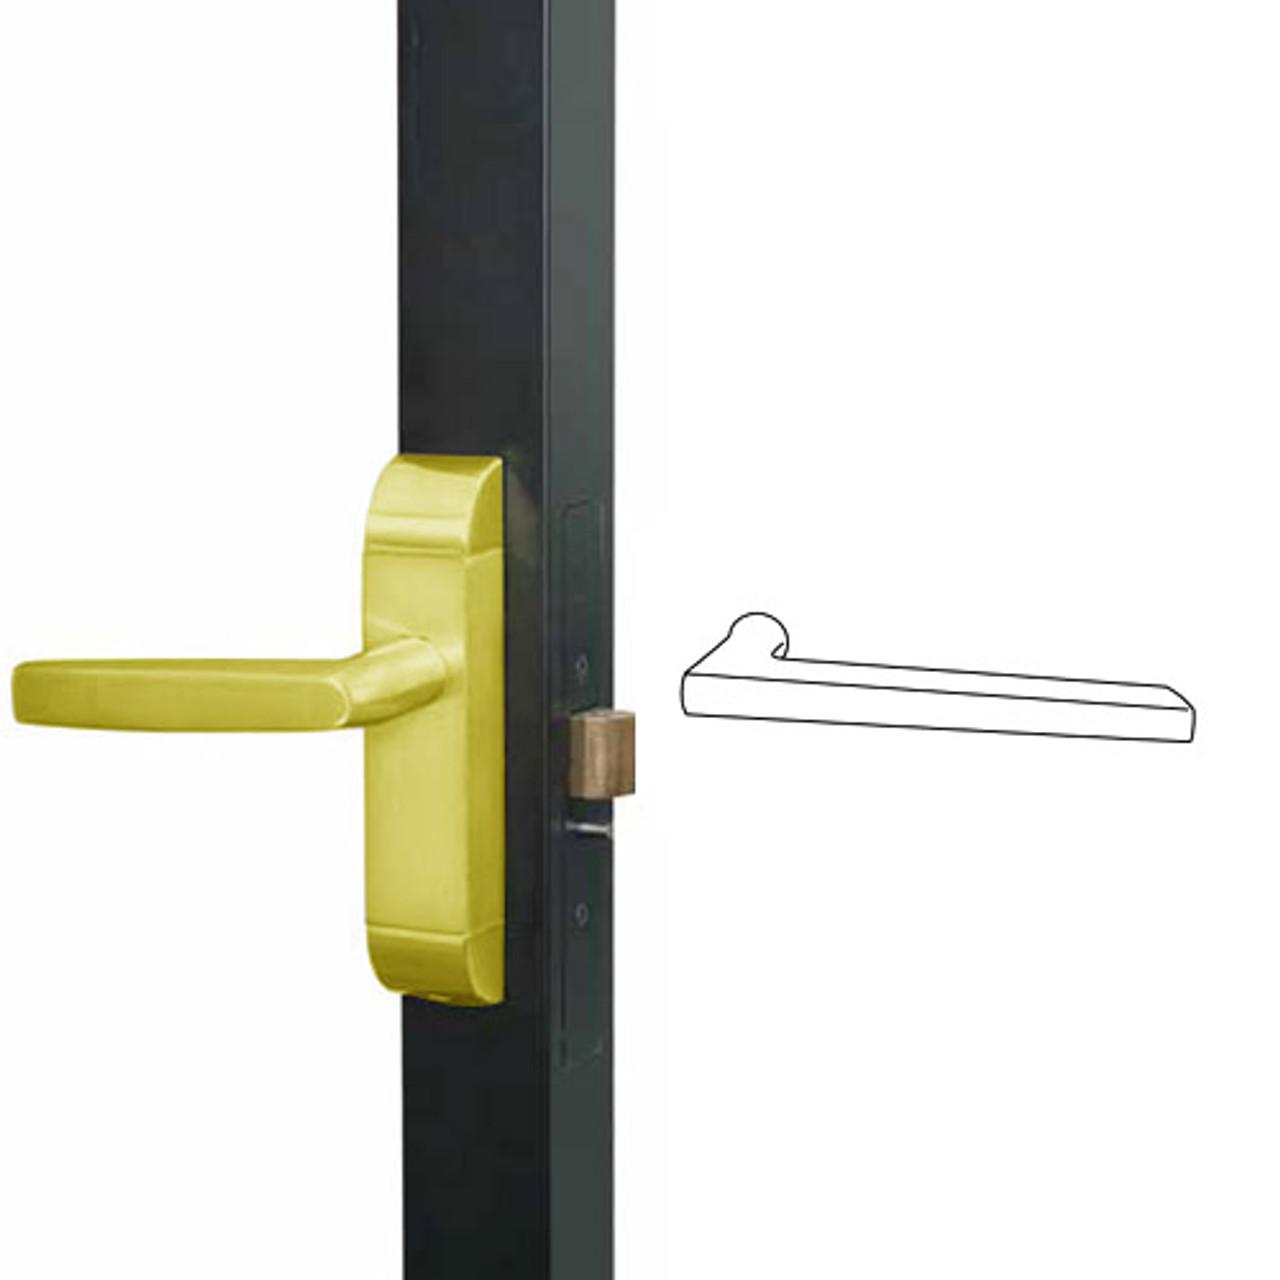 4600-MD-611-US3 Adams Rite MD Designer Deadlatch handle in Bright Brass Finish